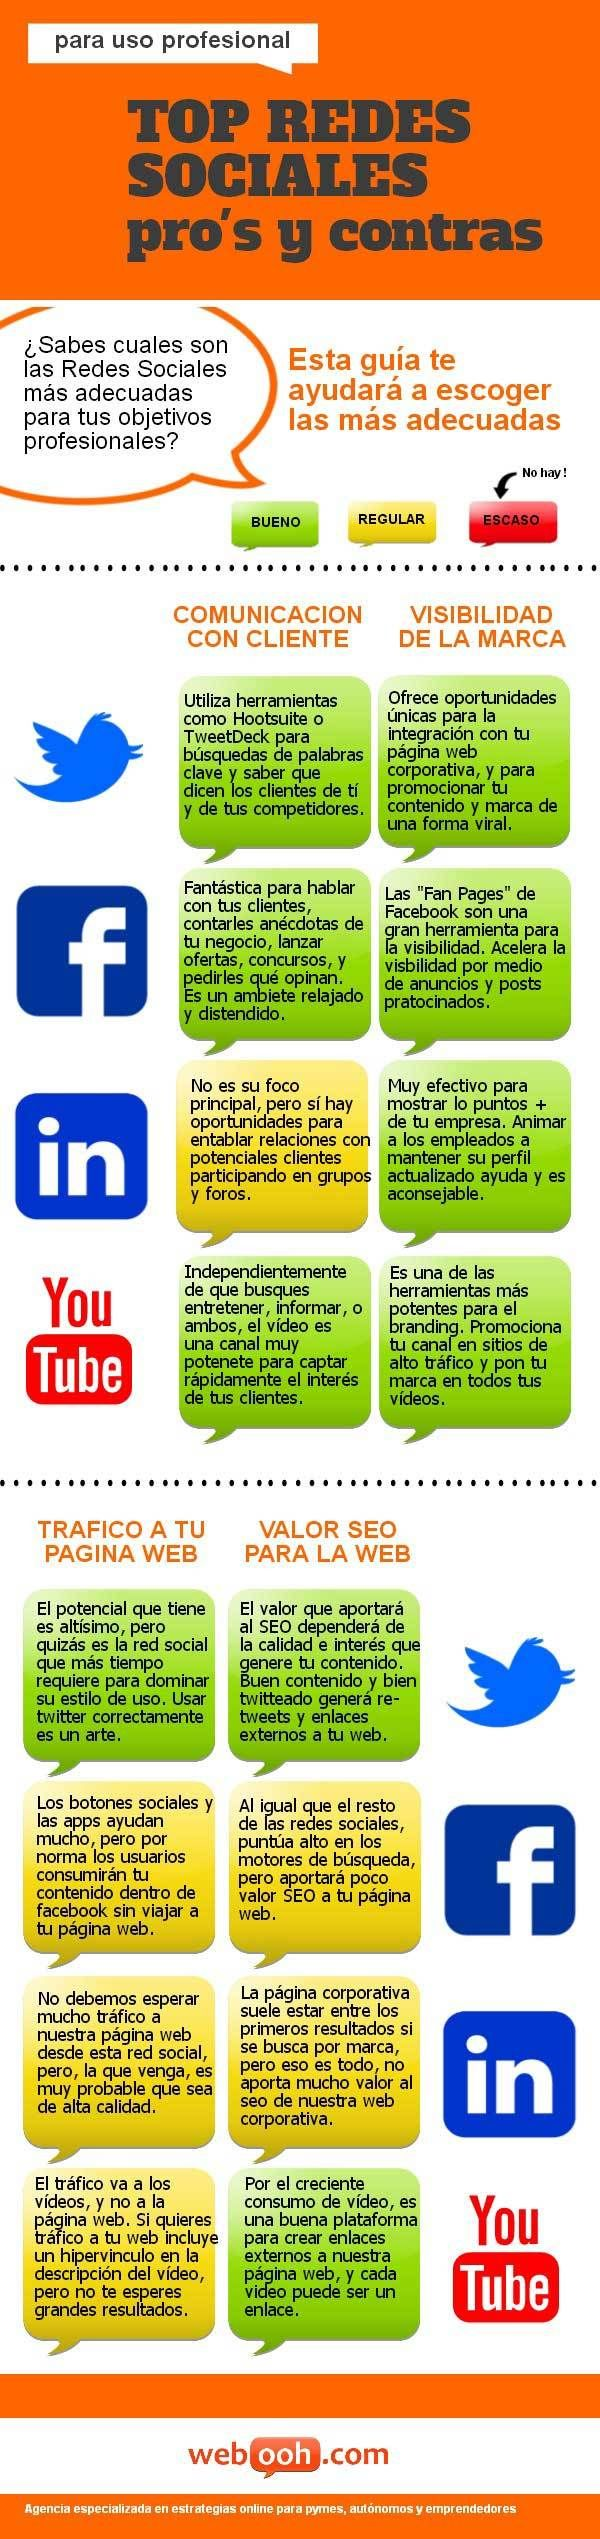 Top Redes Sociales para uso profesional #infografia #infographic #socialmedia